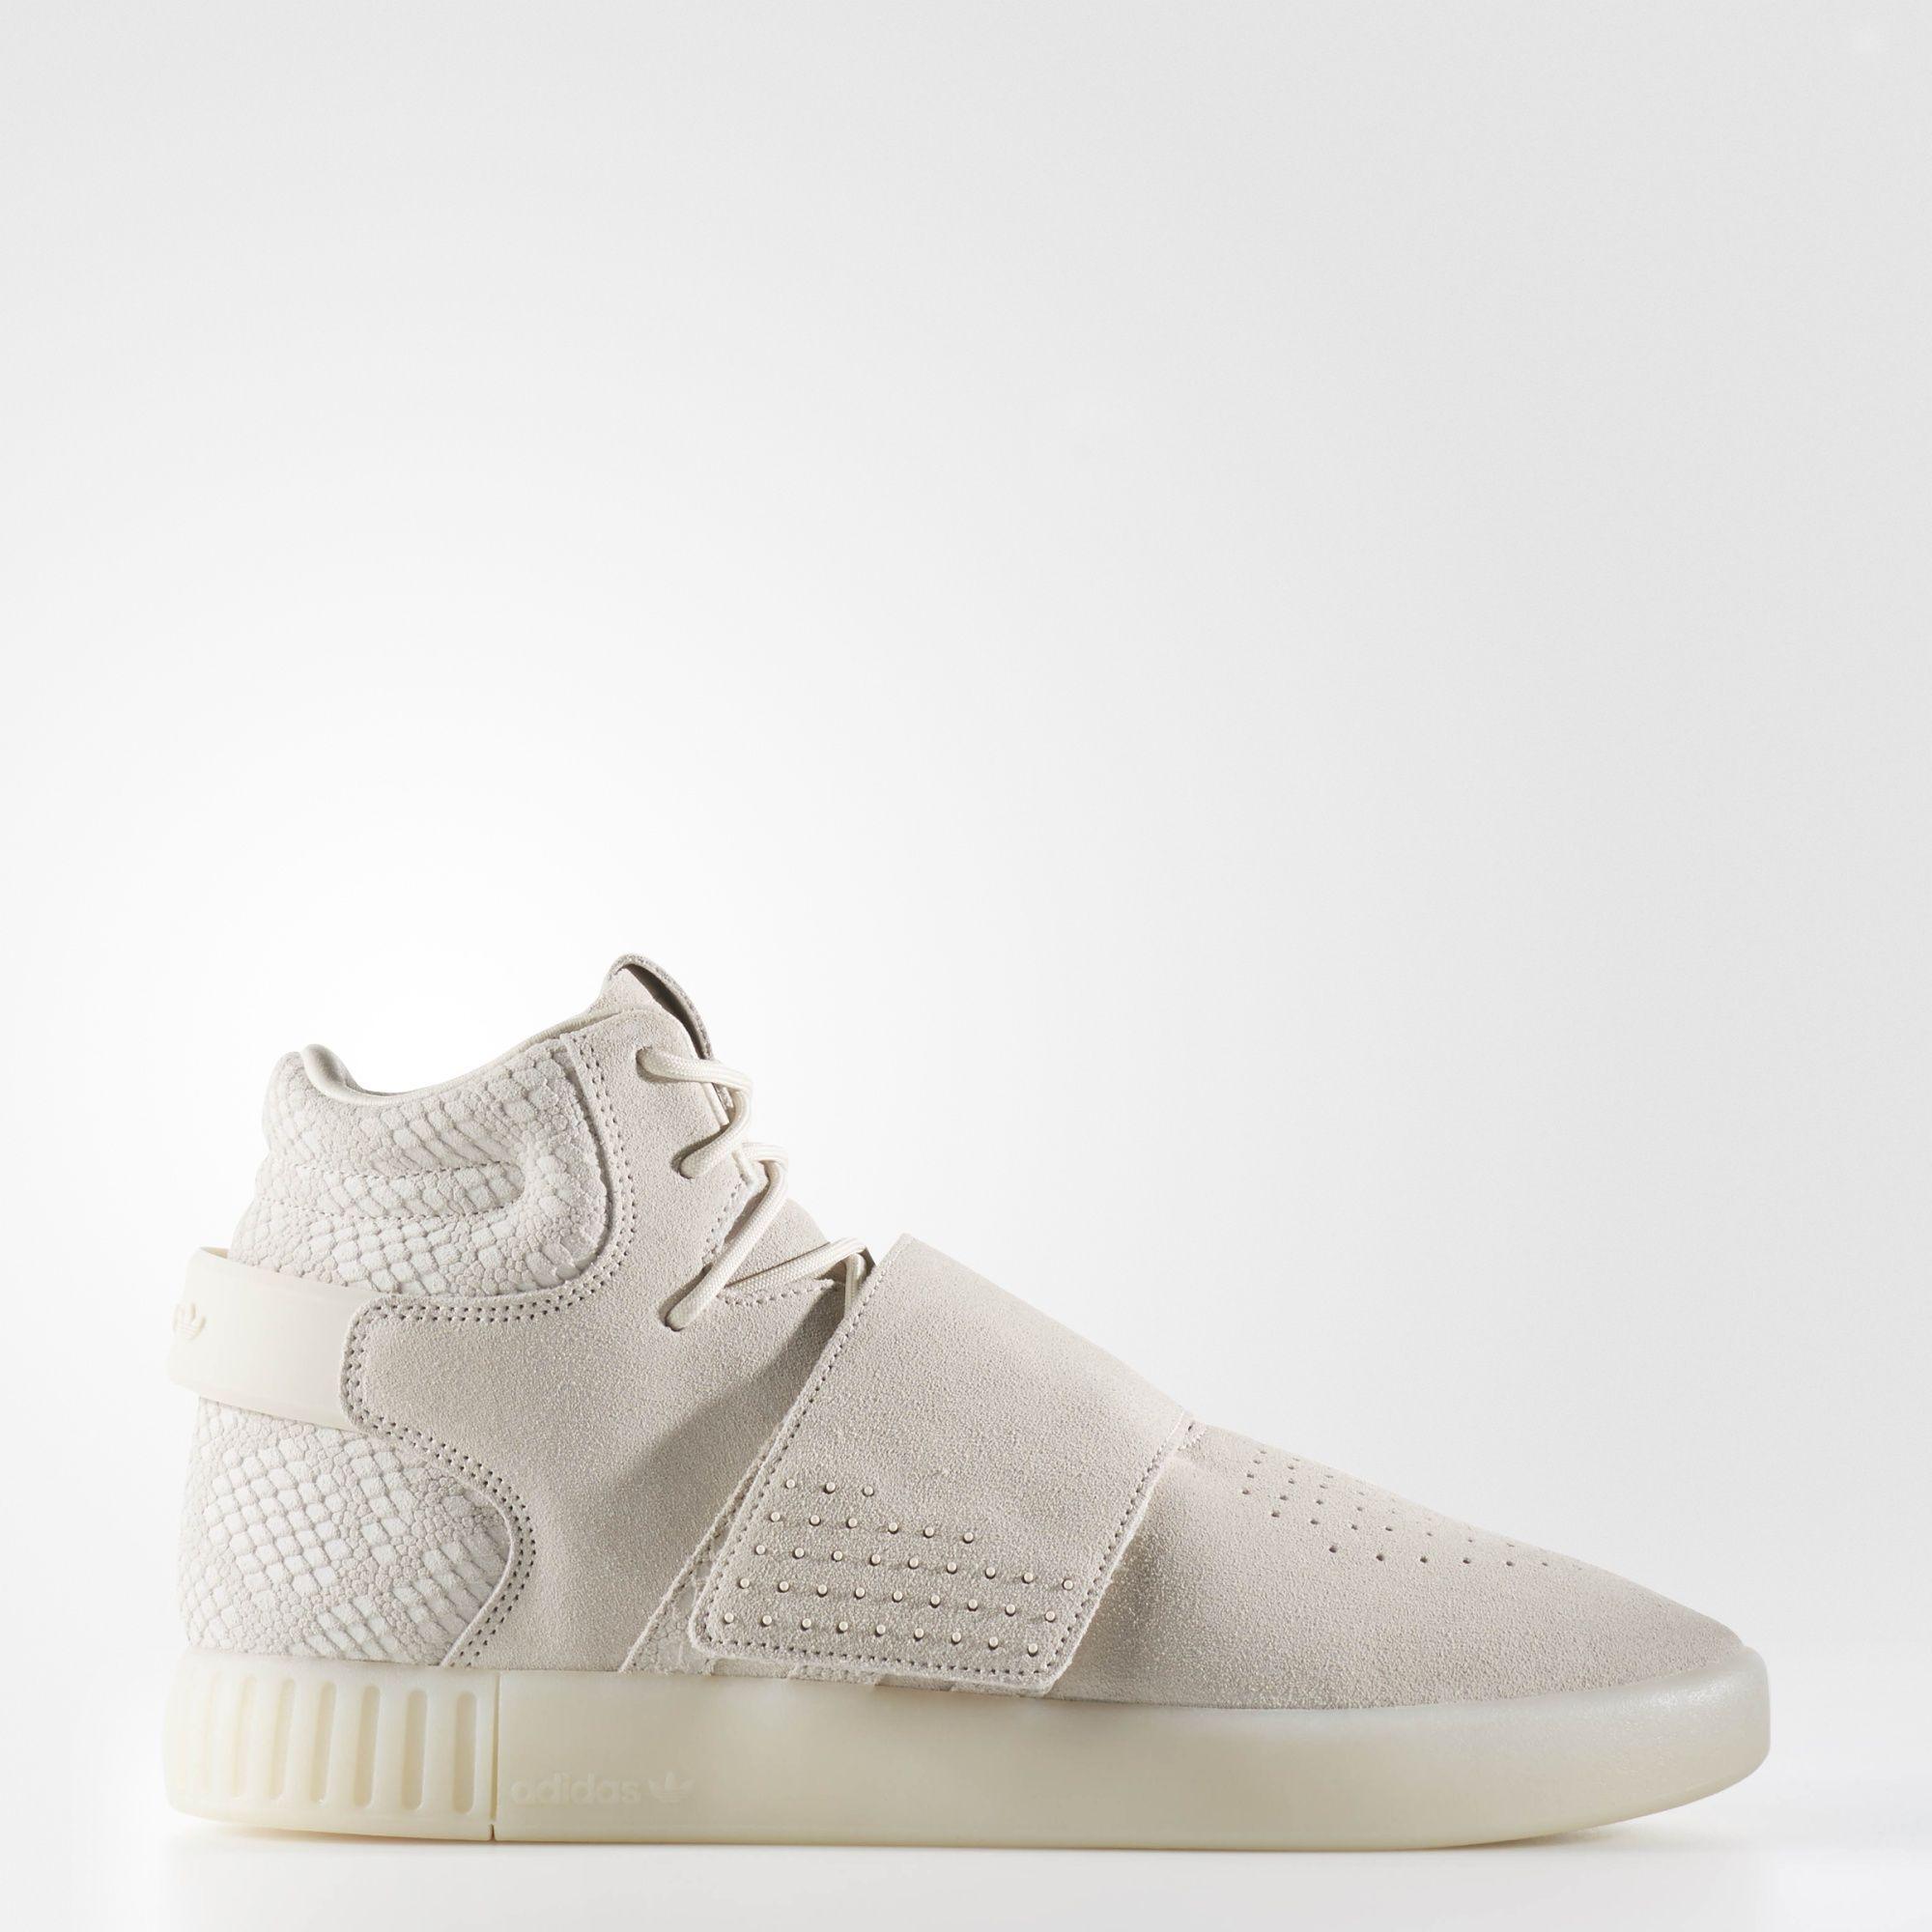 adidas - Buty Tubular Invader Strap Shoes. Tubular ShoesAdidas Original  ShoesBasketball SneakersAdidas MenMan ...